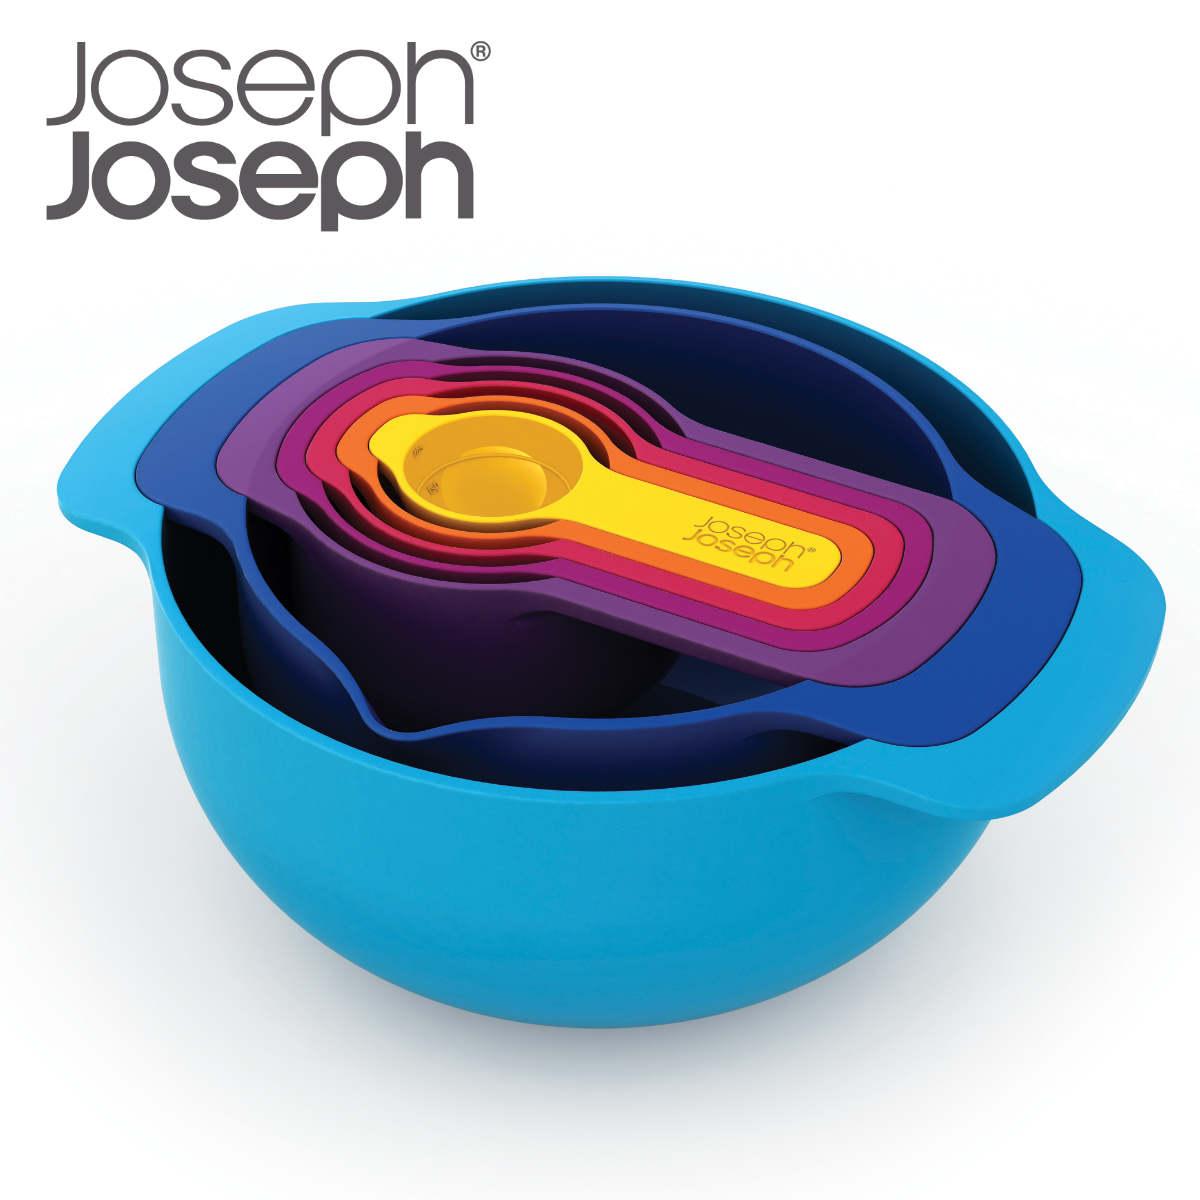 Joseph Joseph ジョゼフジョゼフ NEST7 Plus ネスト7プラス ザル ジョセフジョセフ ( ボウル )